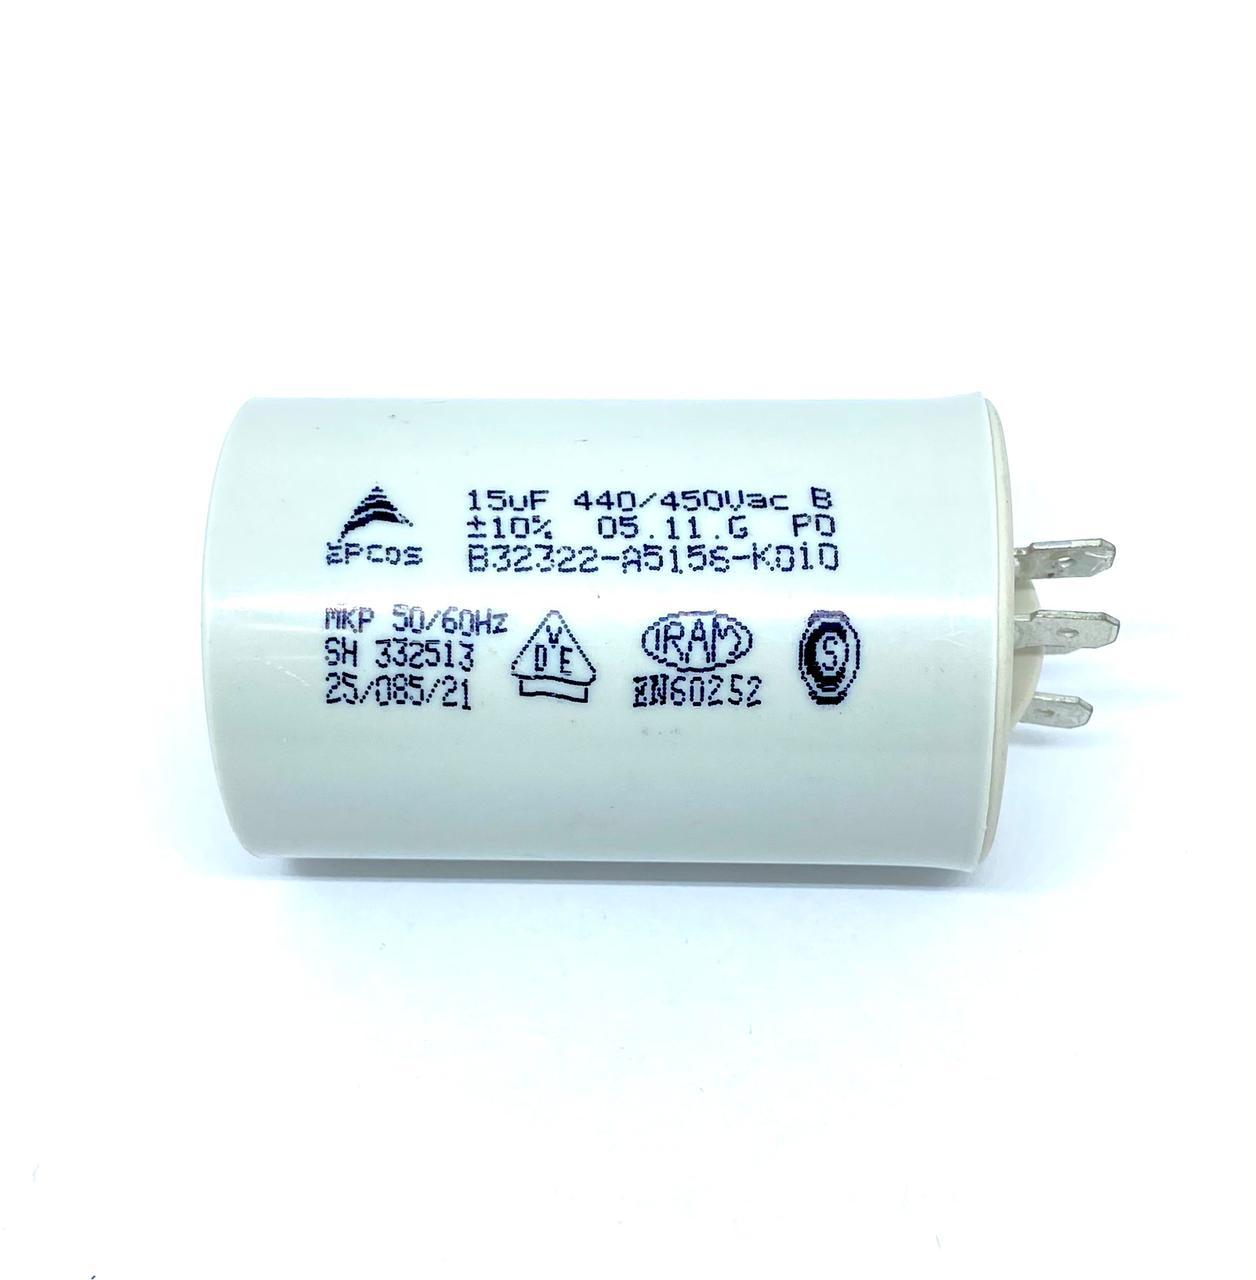 CAPACITOR PPM 15UF 440VCA/450VCA B32322-A5156-K010 40X72MM FASTON EPCOS (B32322A5156K010)